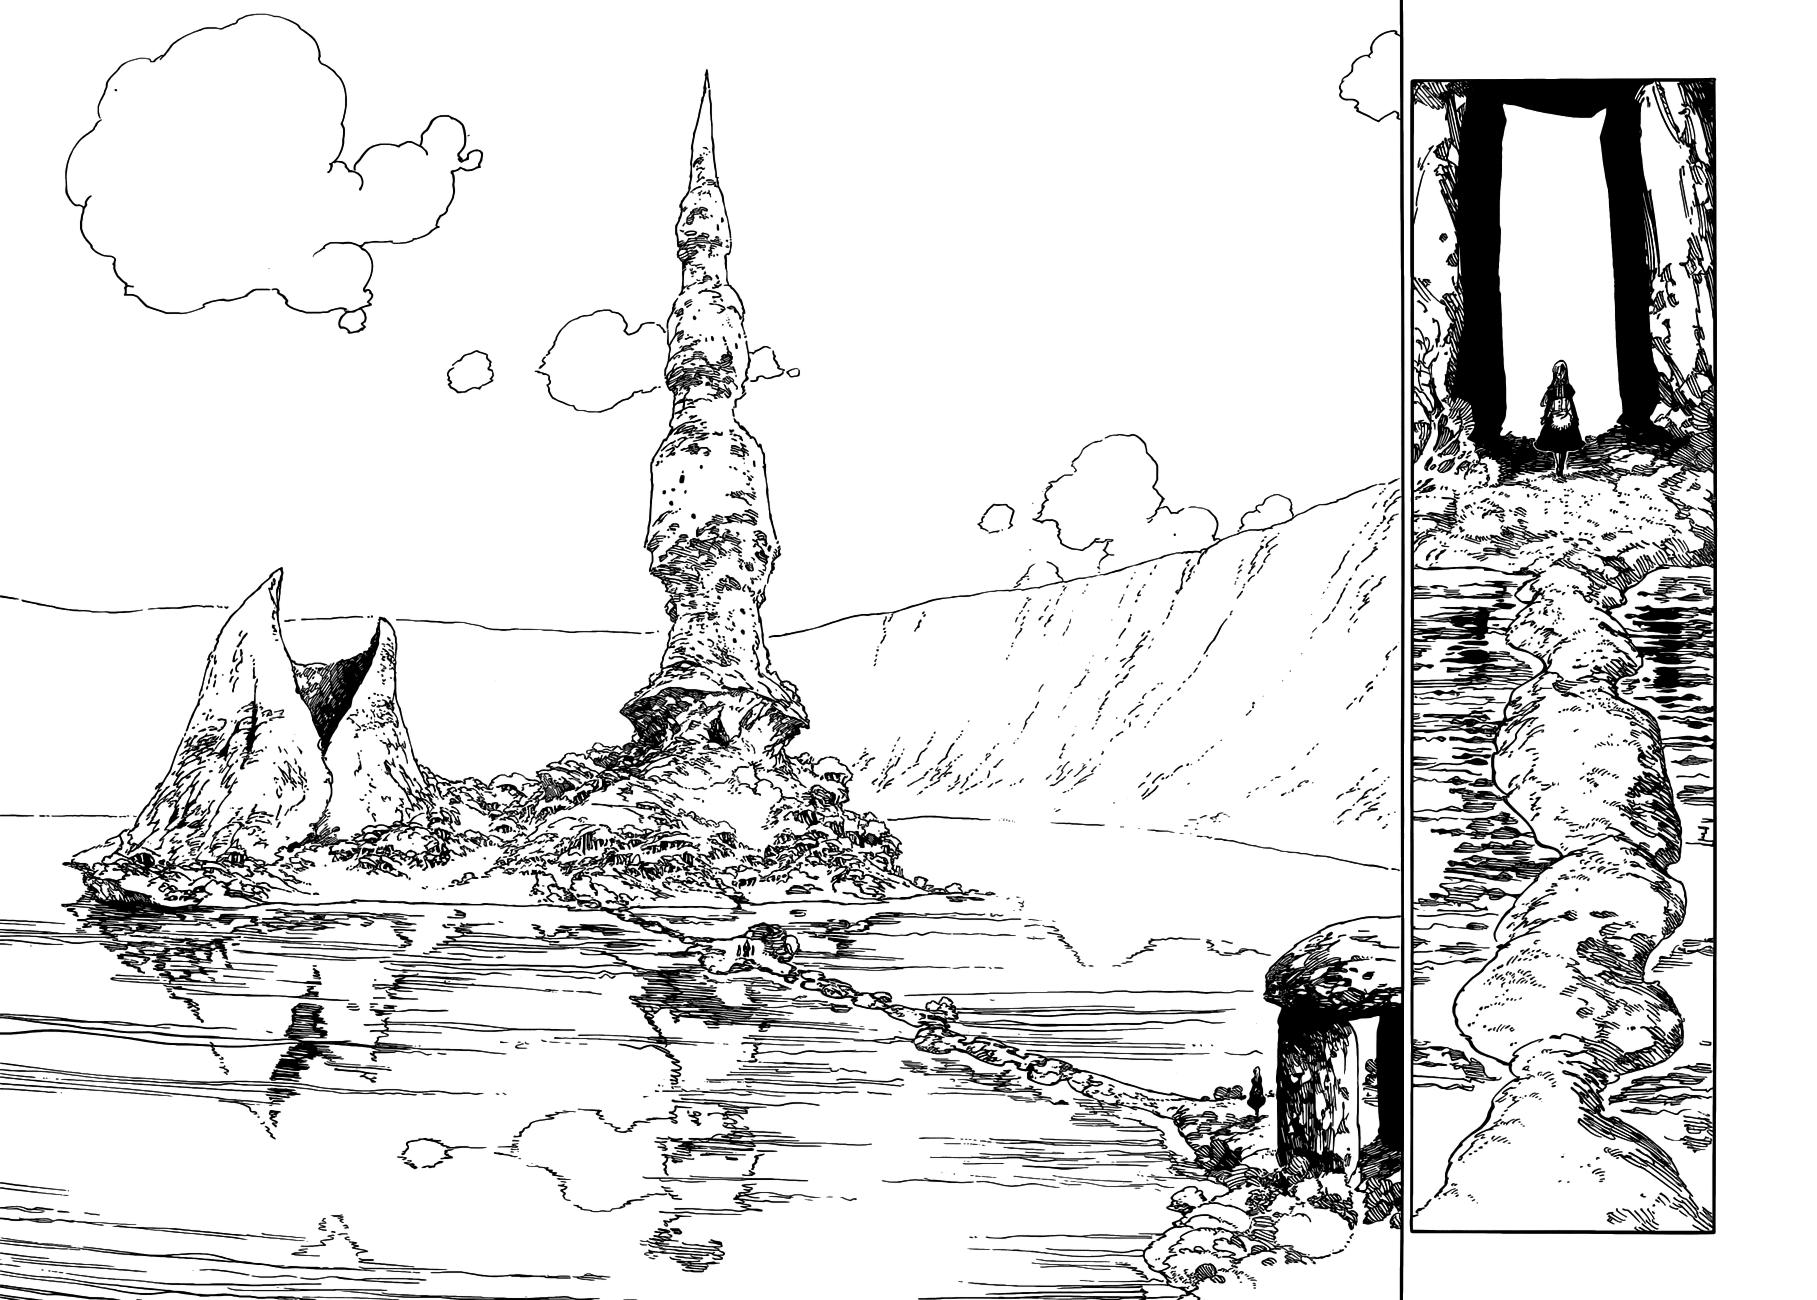 Nanatsu no Taizai - Thất Hình Đại Tội chap 129 page 6 - IZTruyenTranh.com